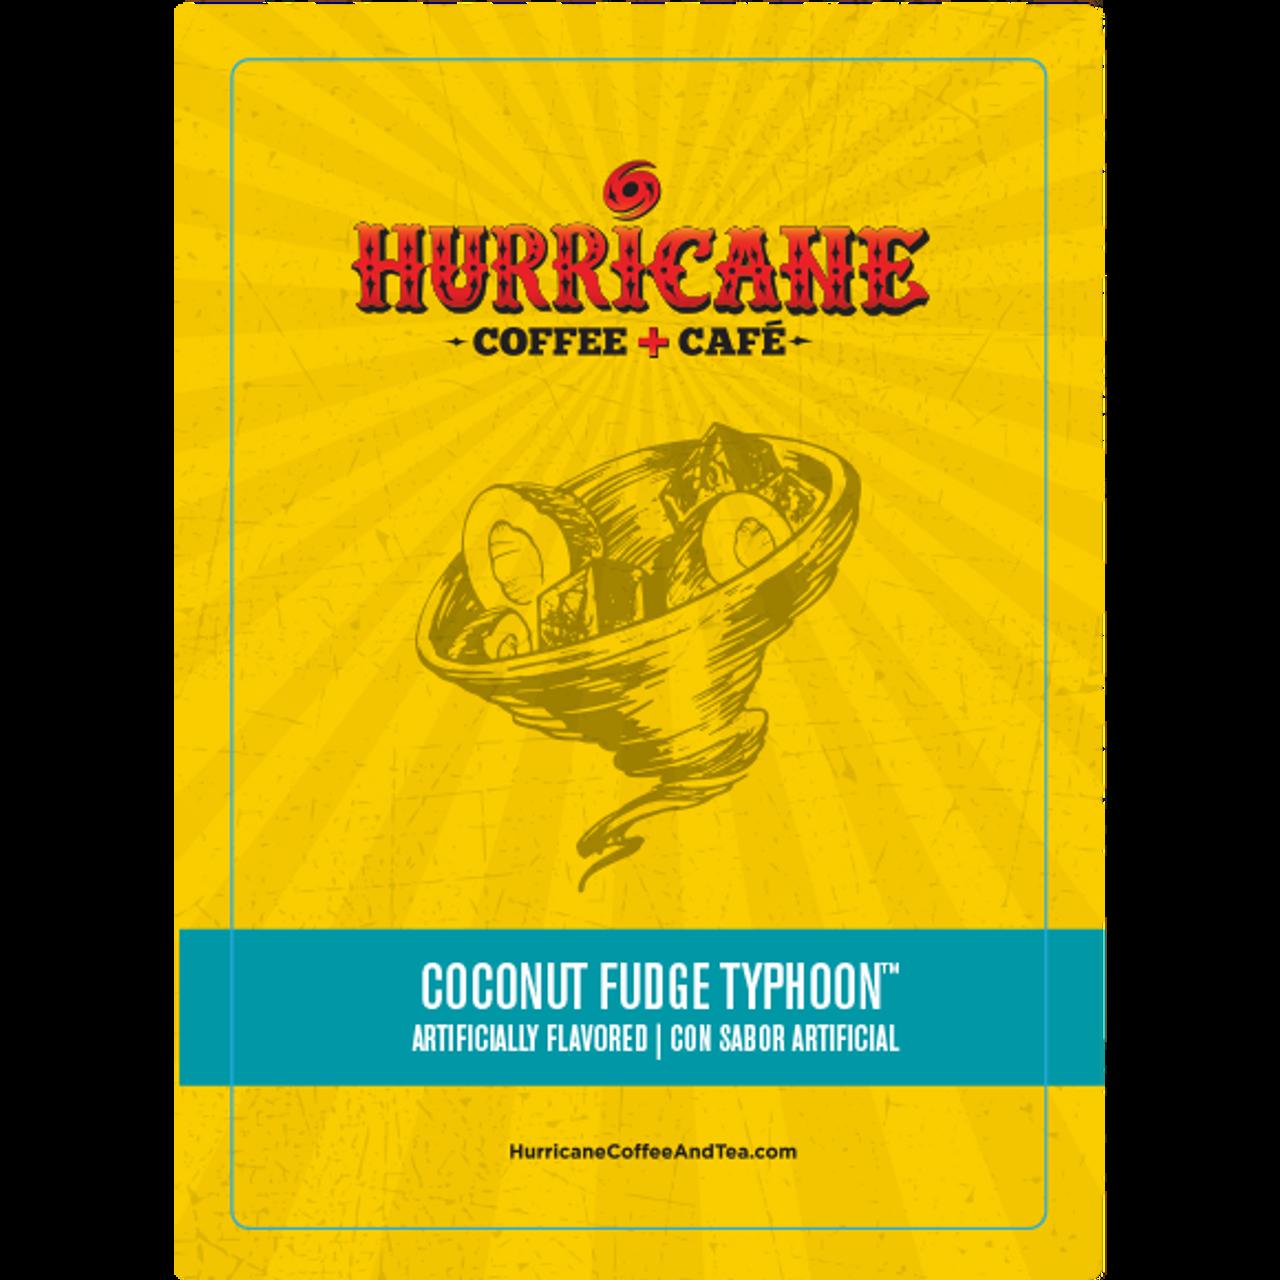 Coconut Fudge Typhoon Flavored Coffee by Hurricane